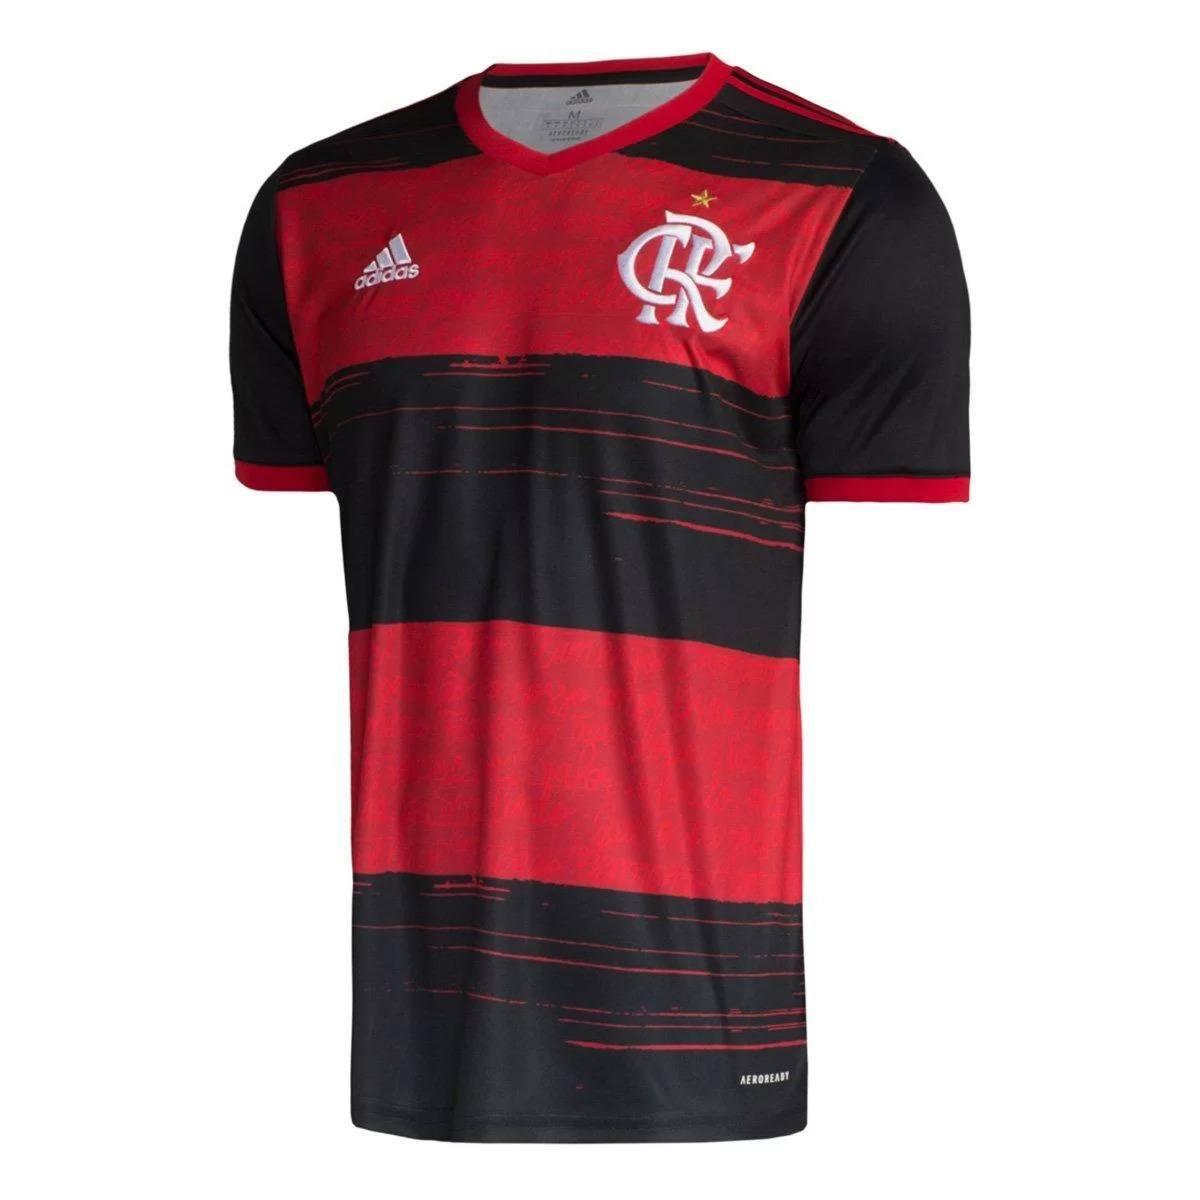 Camisa Flamengo I 20/21 s/n° Torcedor Adidas Masculina